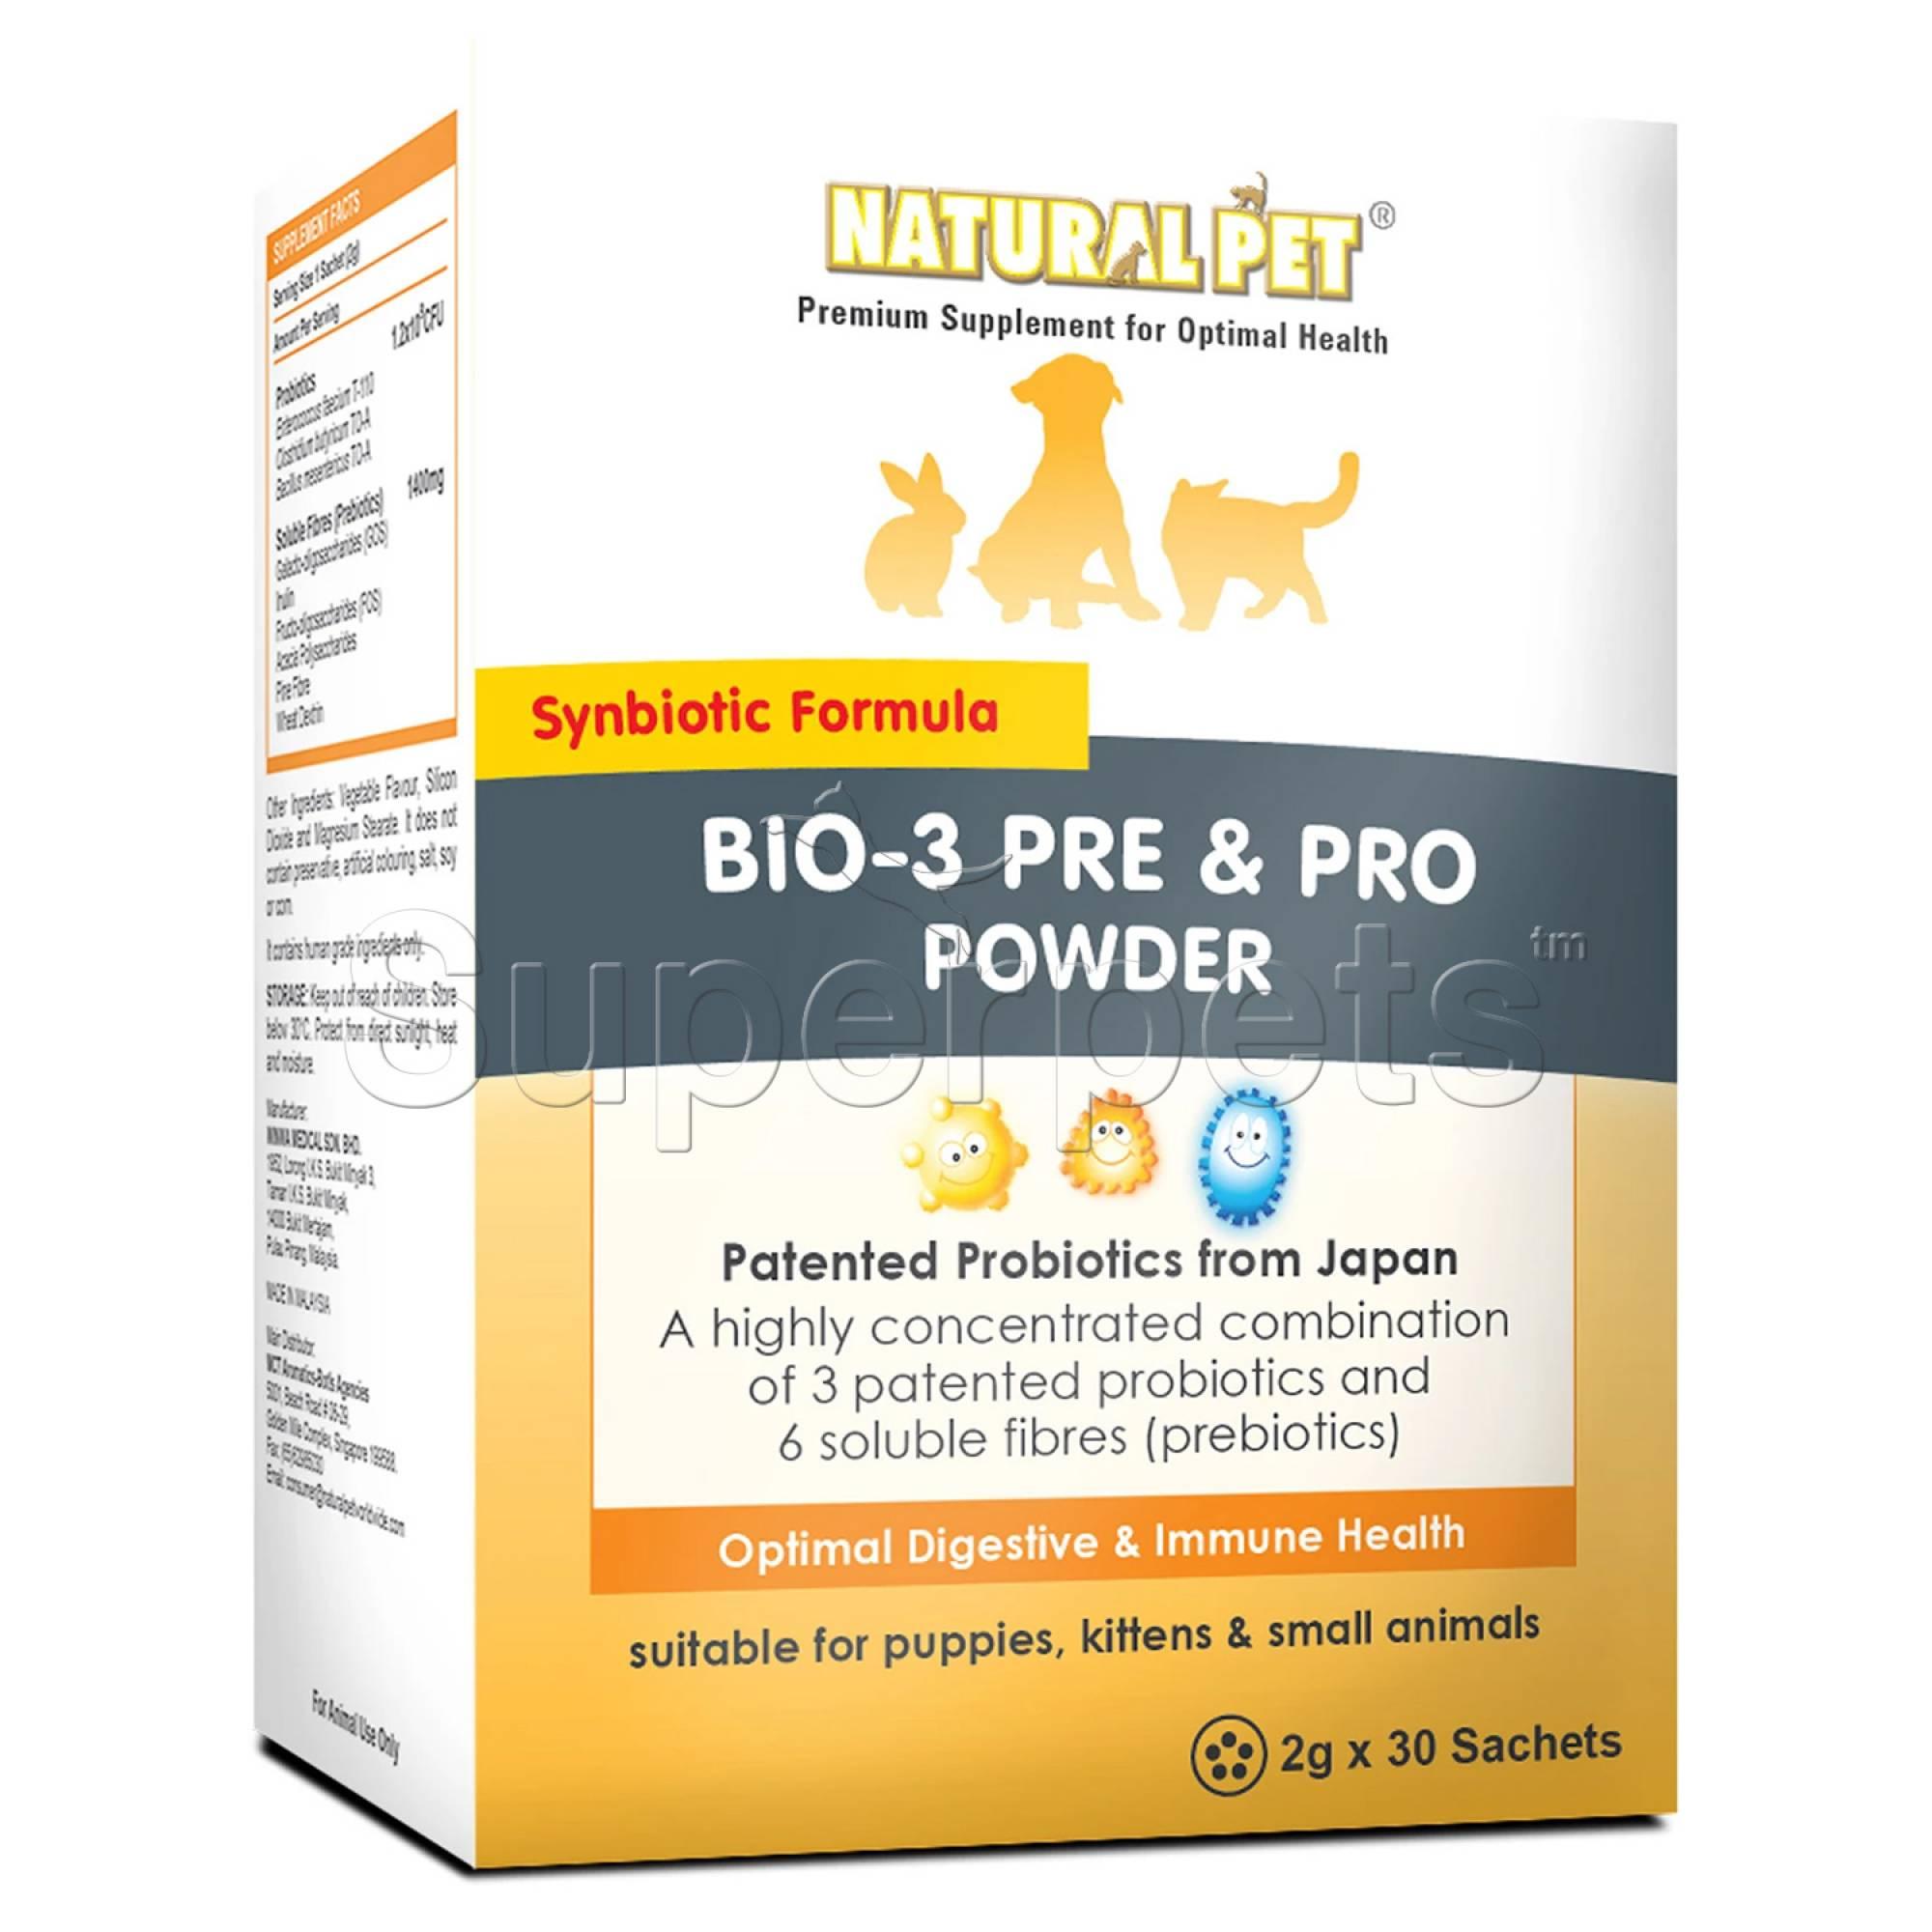 Natural Pet - Bio-3 Pre & Pro Powder - 2g x 30 Sachets